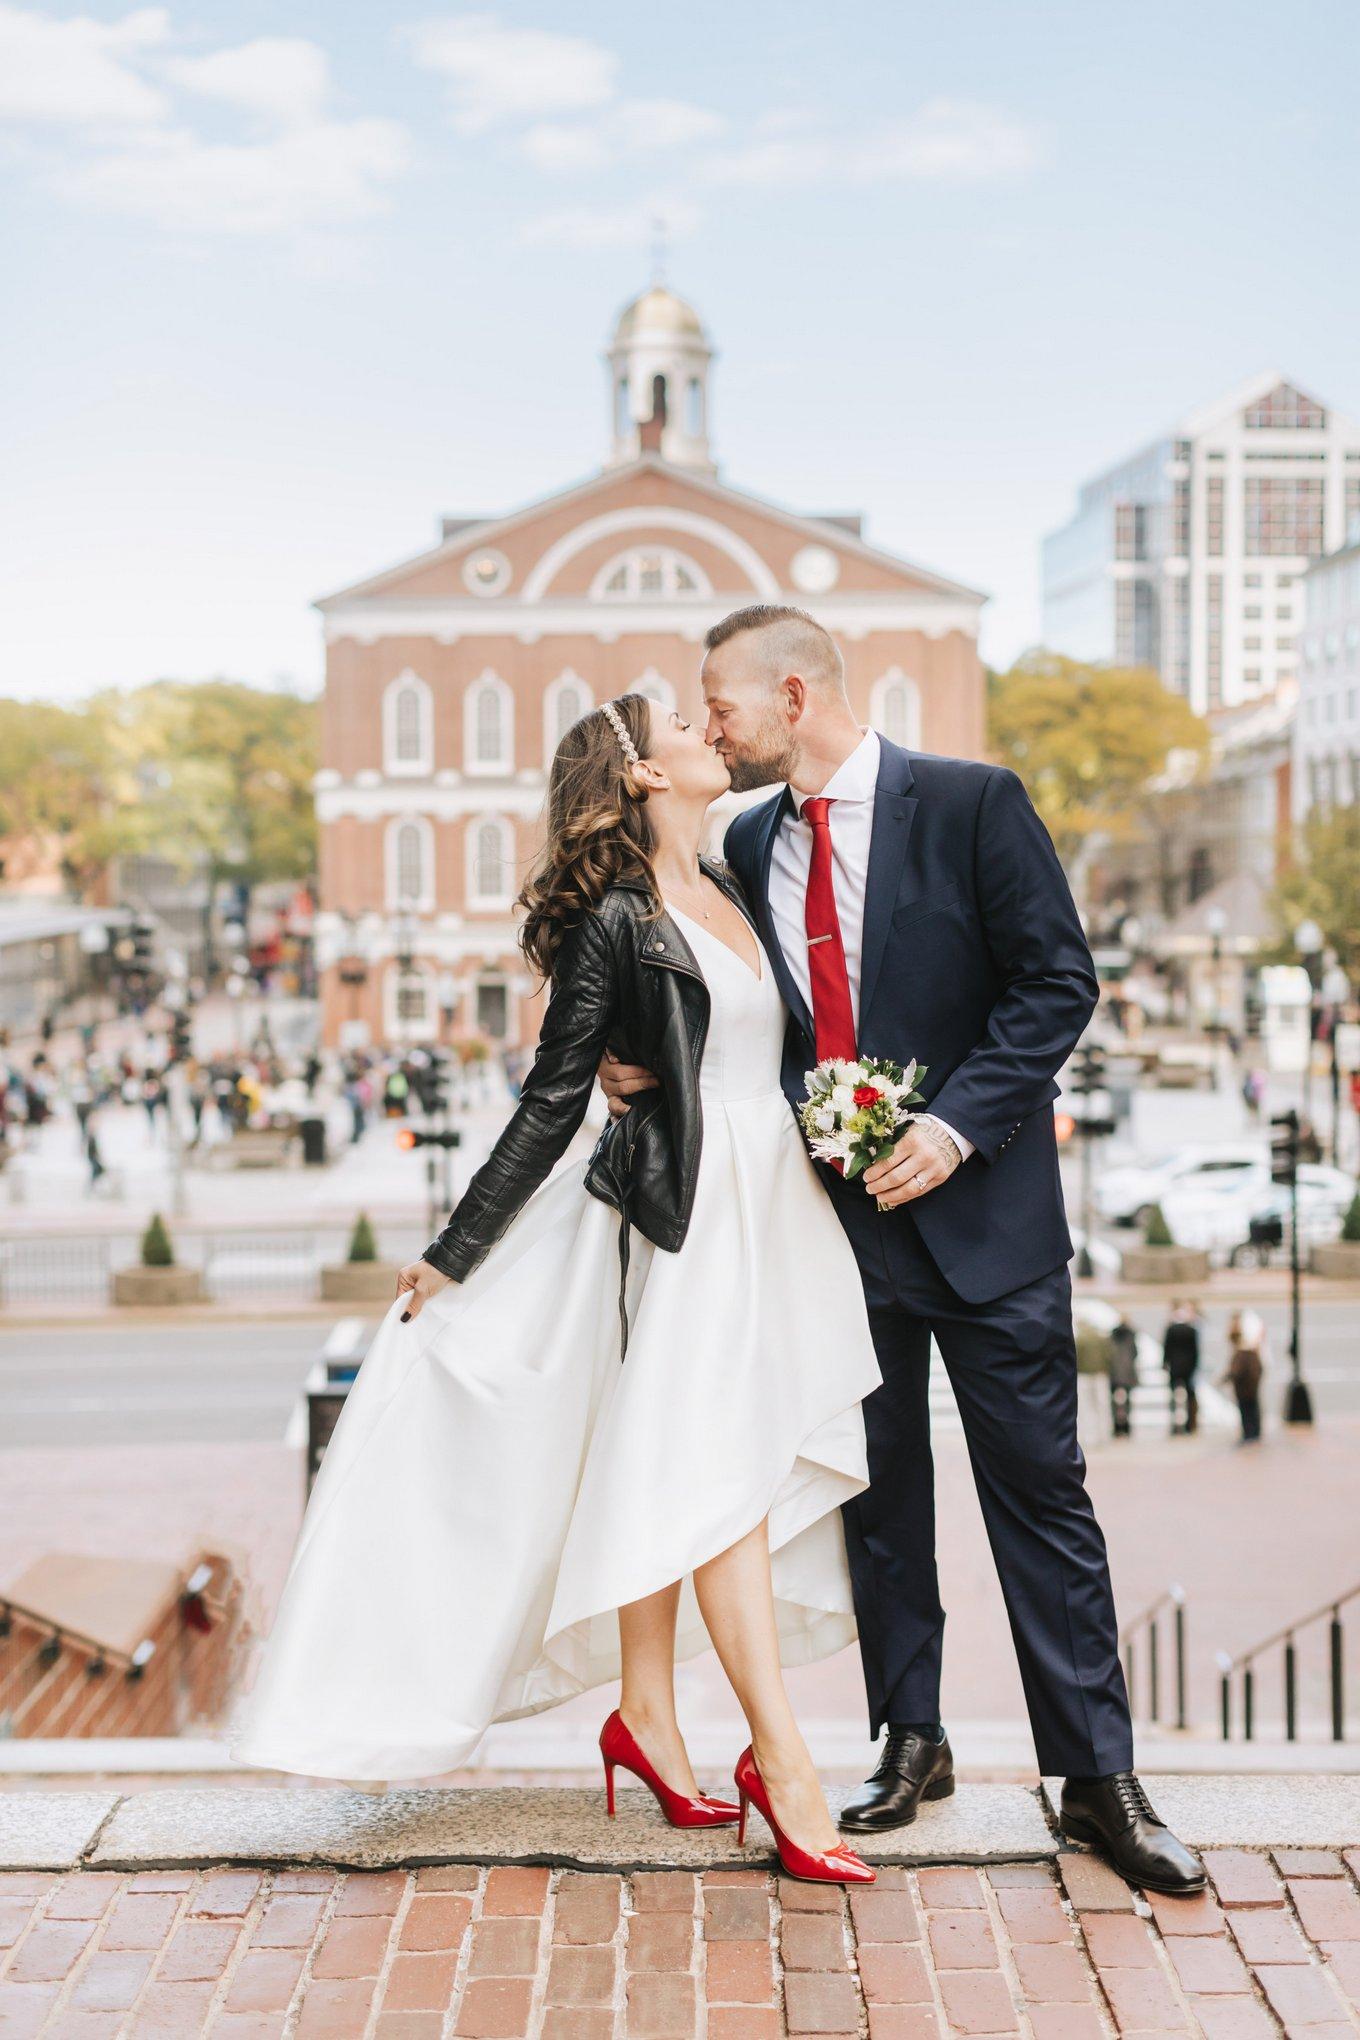 Boston-City-Hall-Wedding-Elopement-Photographer-Lena-Mirisola-5.JPG